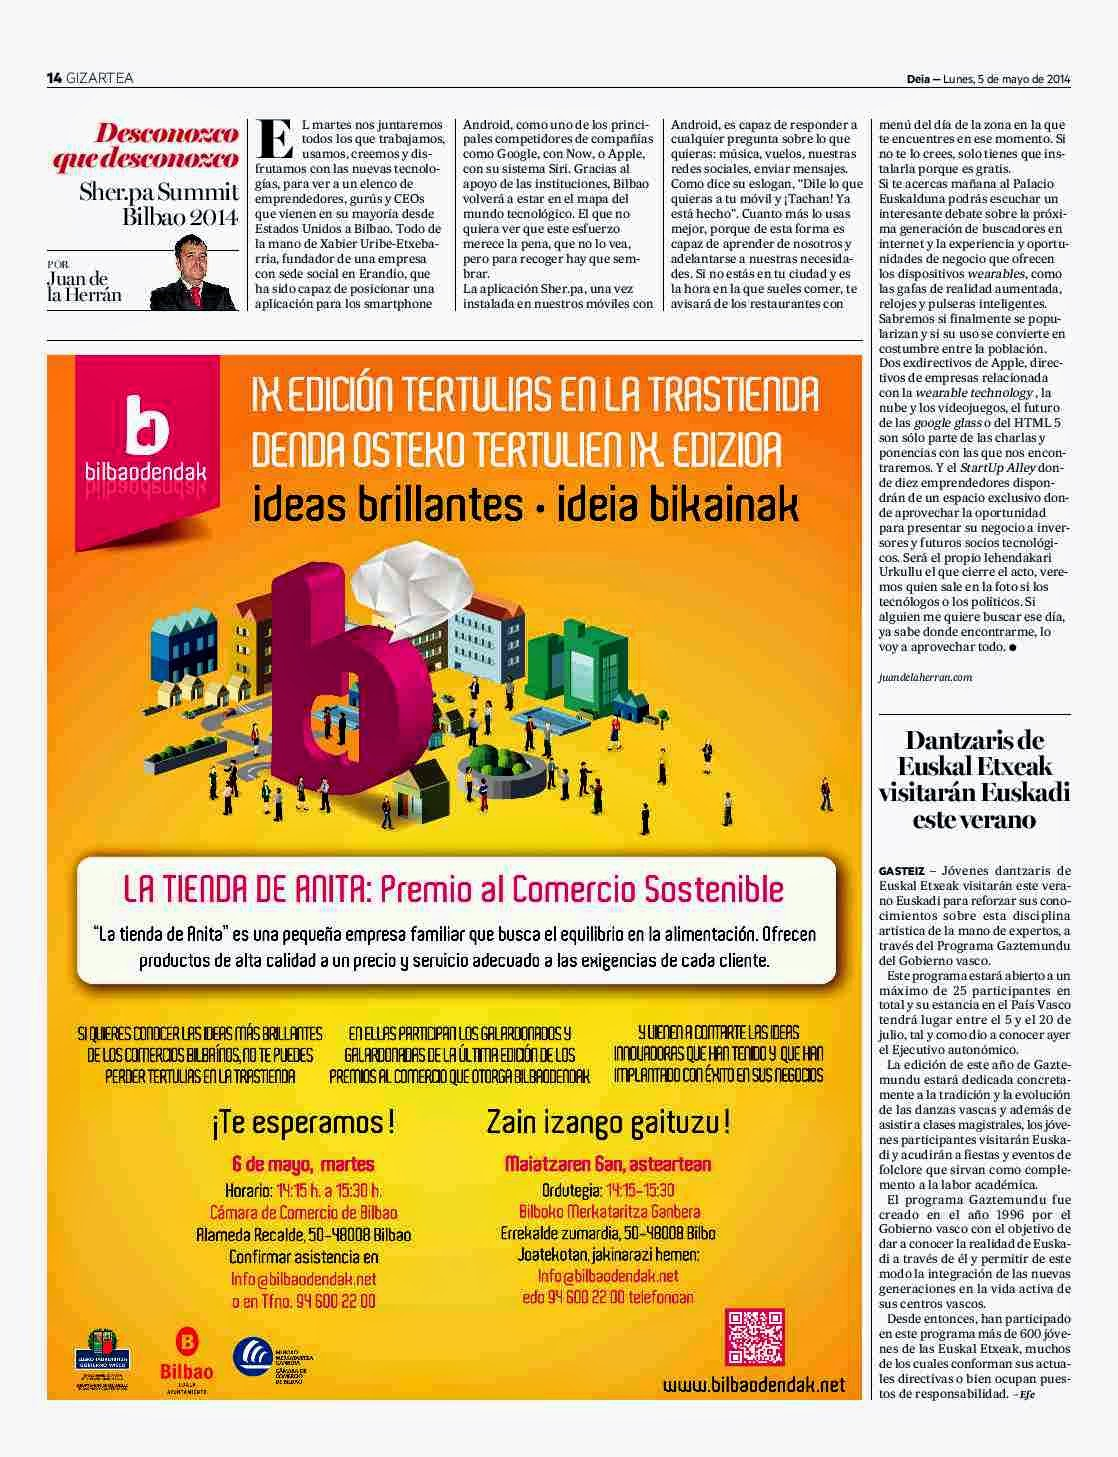 Sher.pa Summit Bilbao 2014